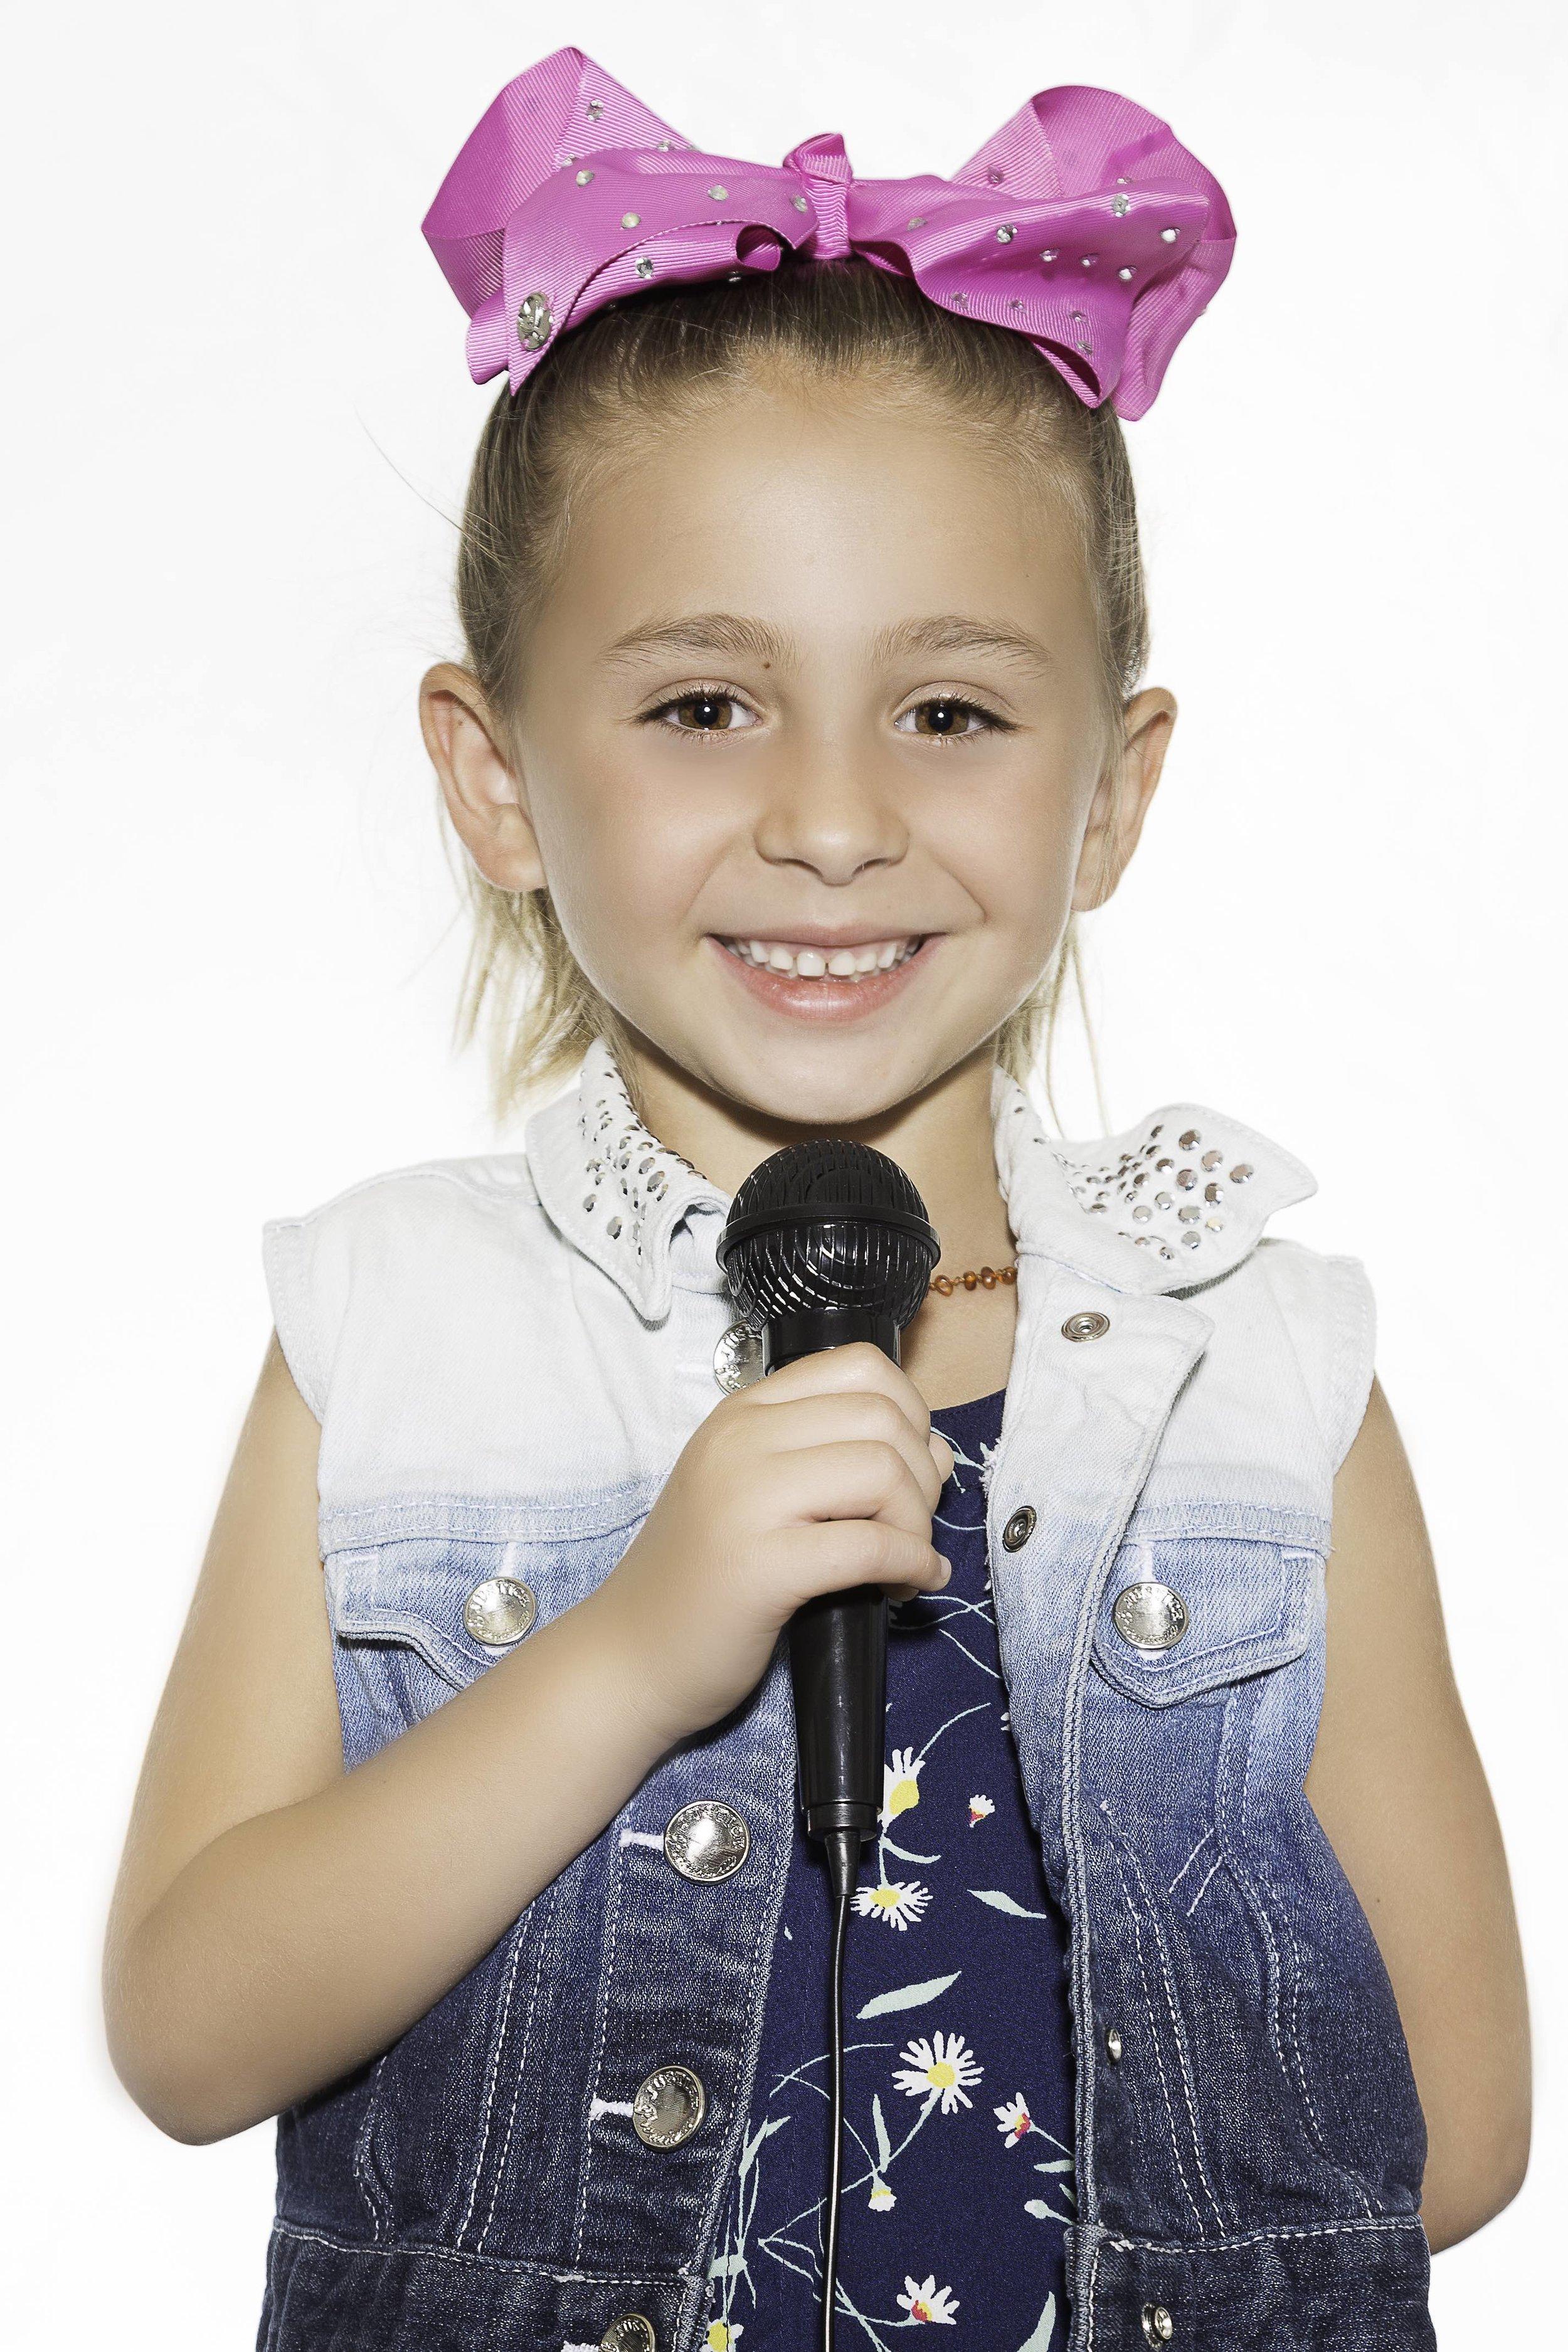 Emmi loves singing Taylor Swift songs!